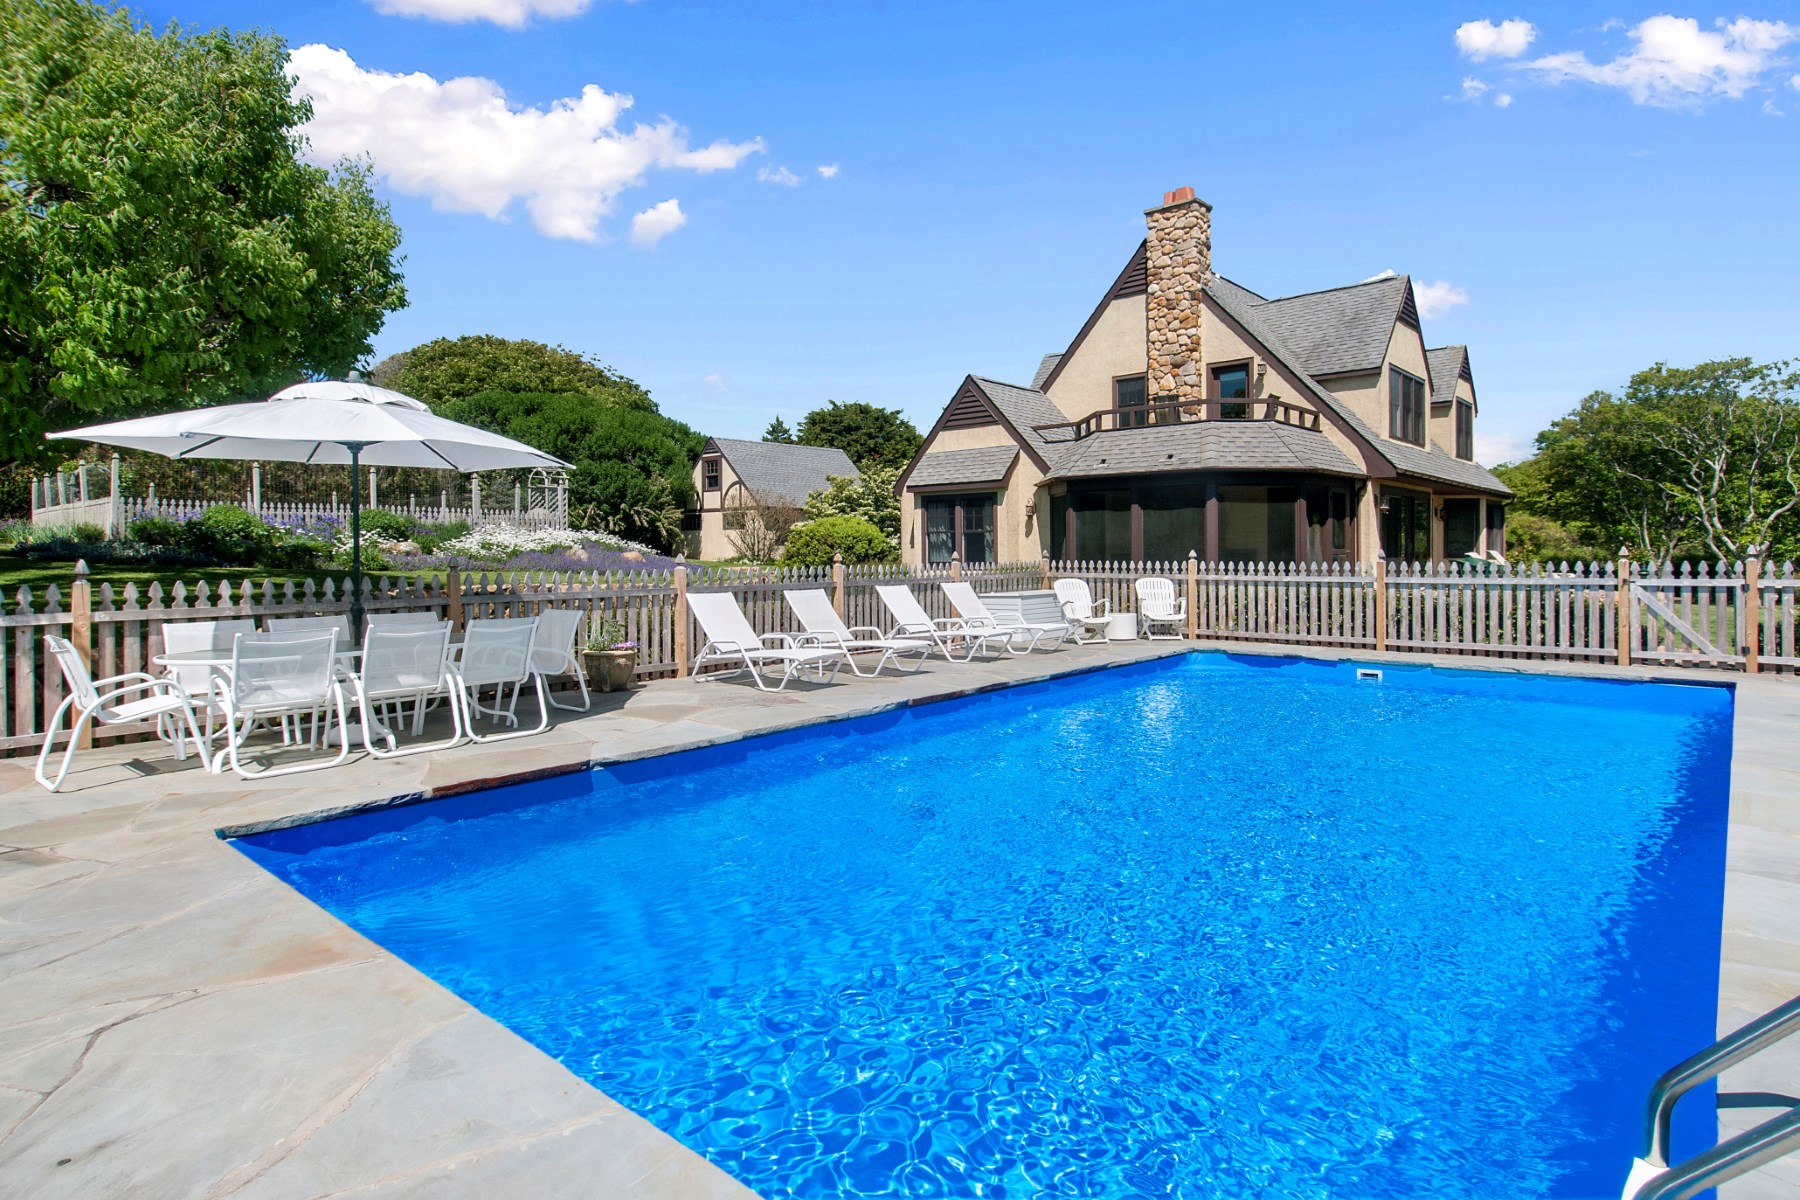 Single Family Home for Rent at Charming Montauk Tudor 169 South Fairview Avenue Montauk, New York 11954 United States